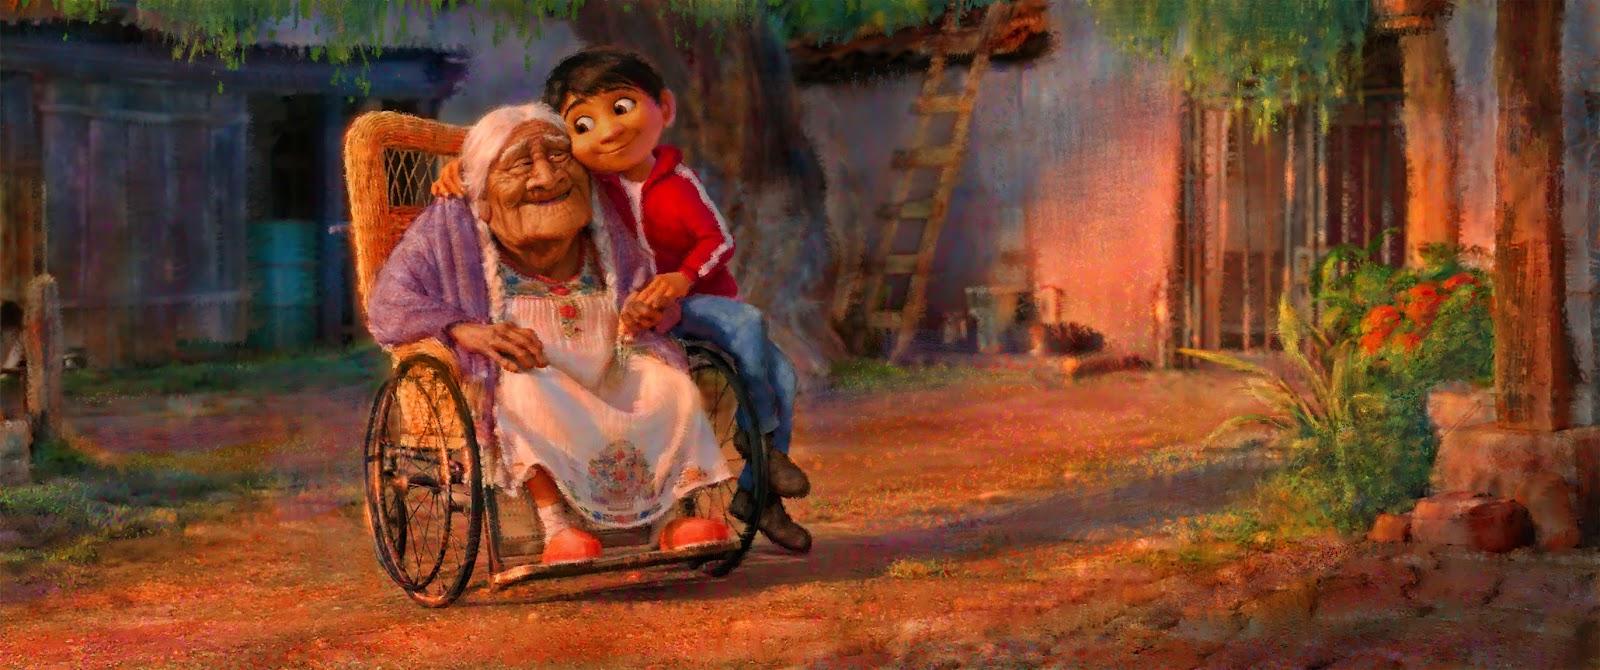 artwork coco disney pixar